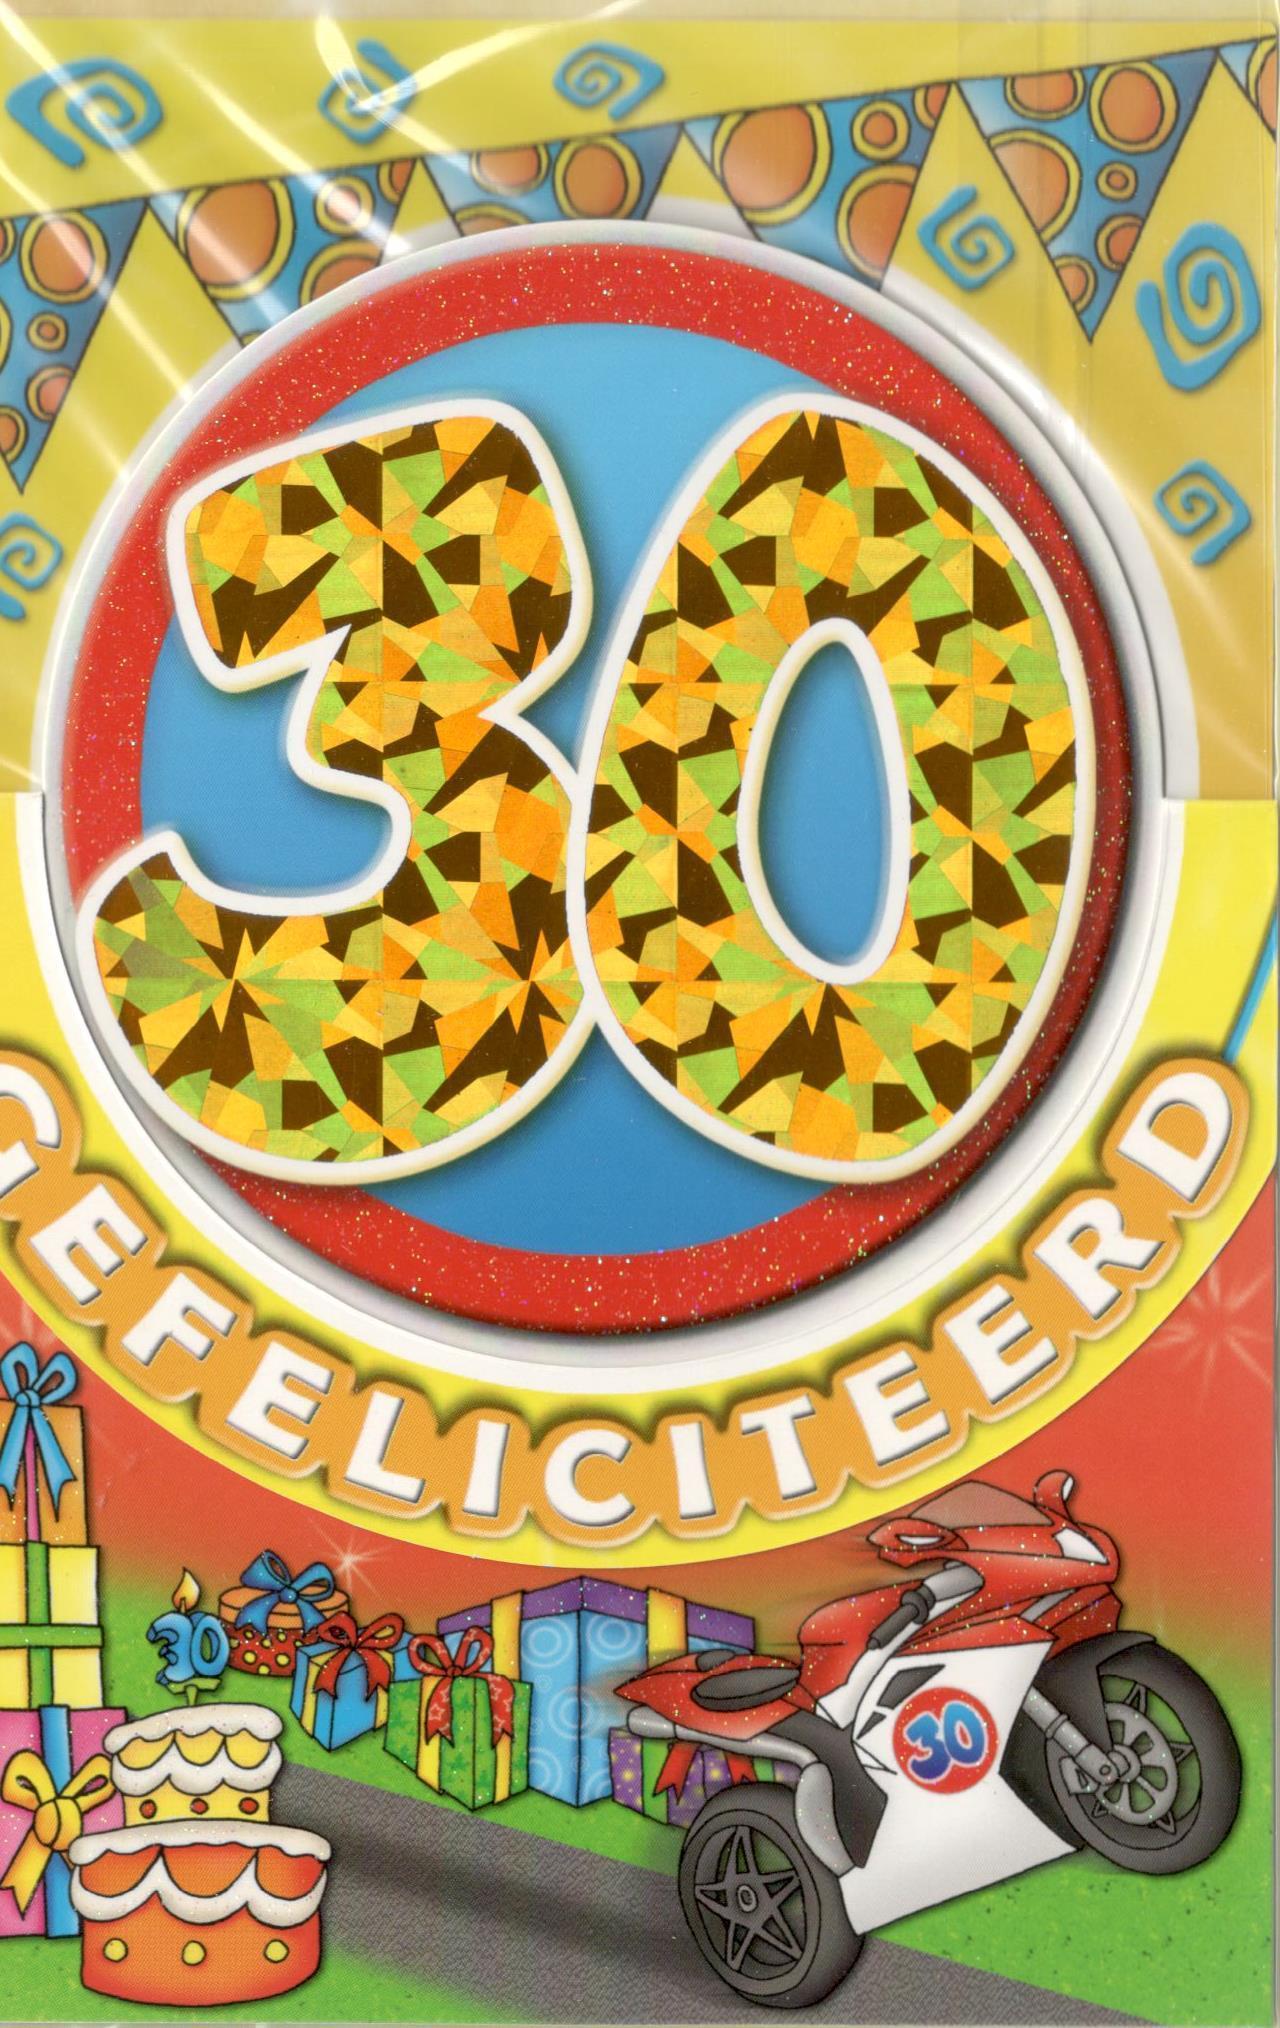 Verjaardagskaart 40 Jaar Gratis